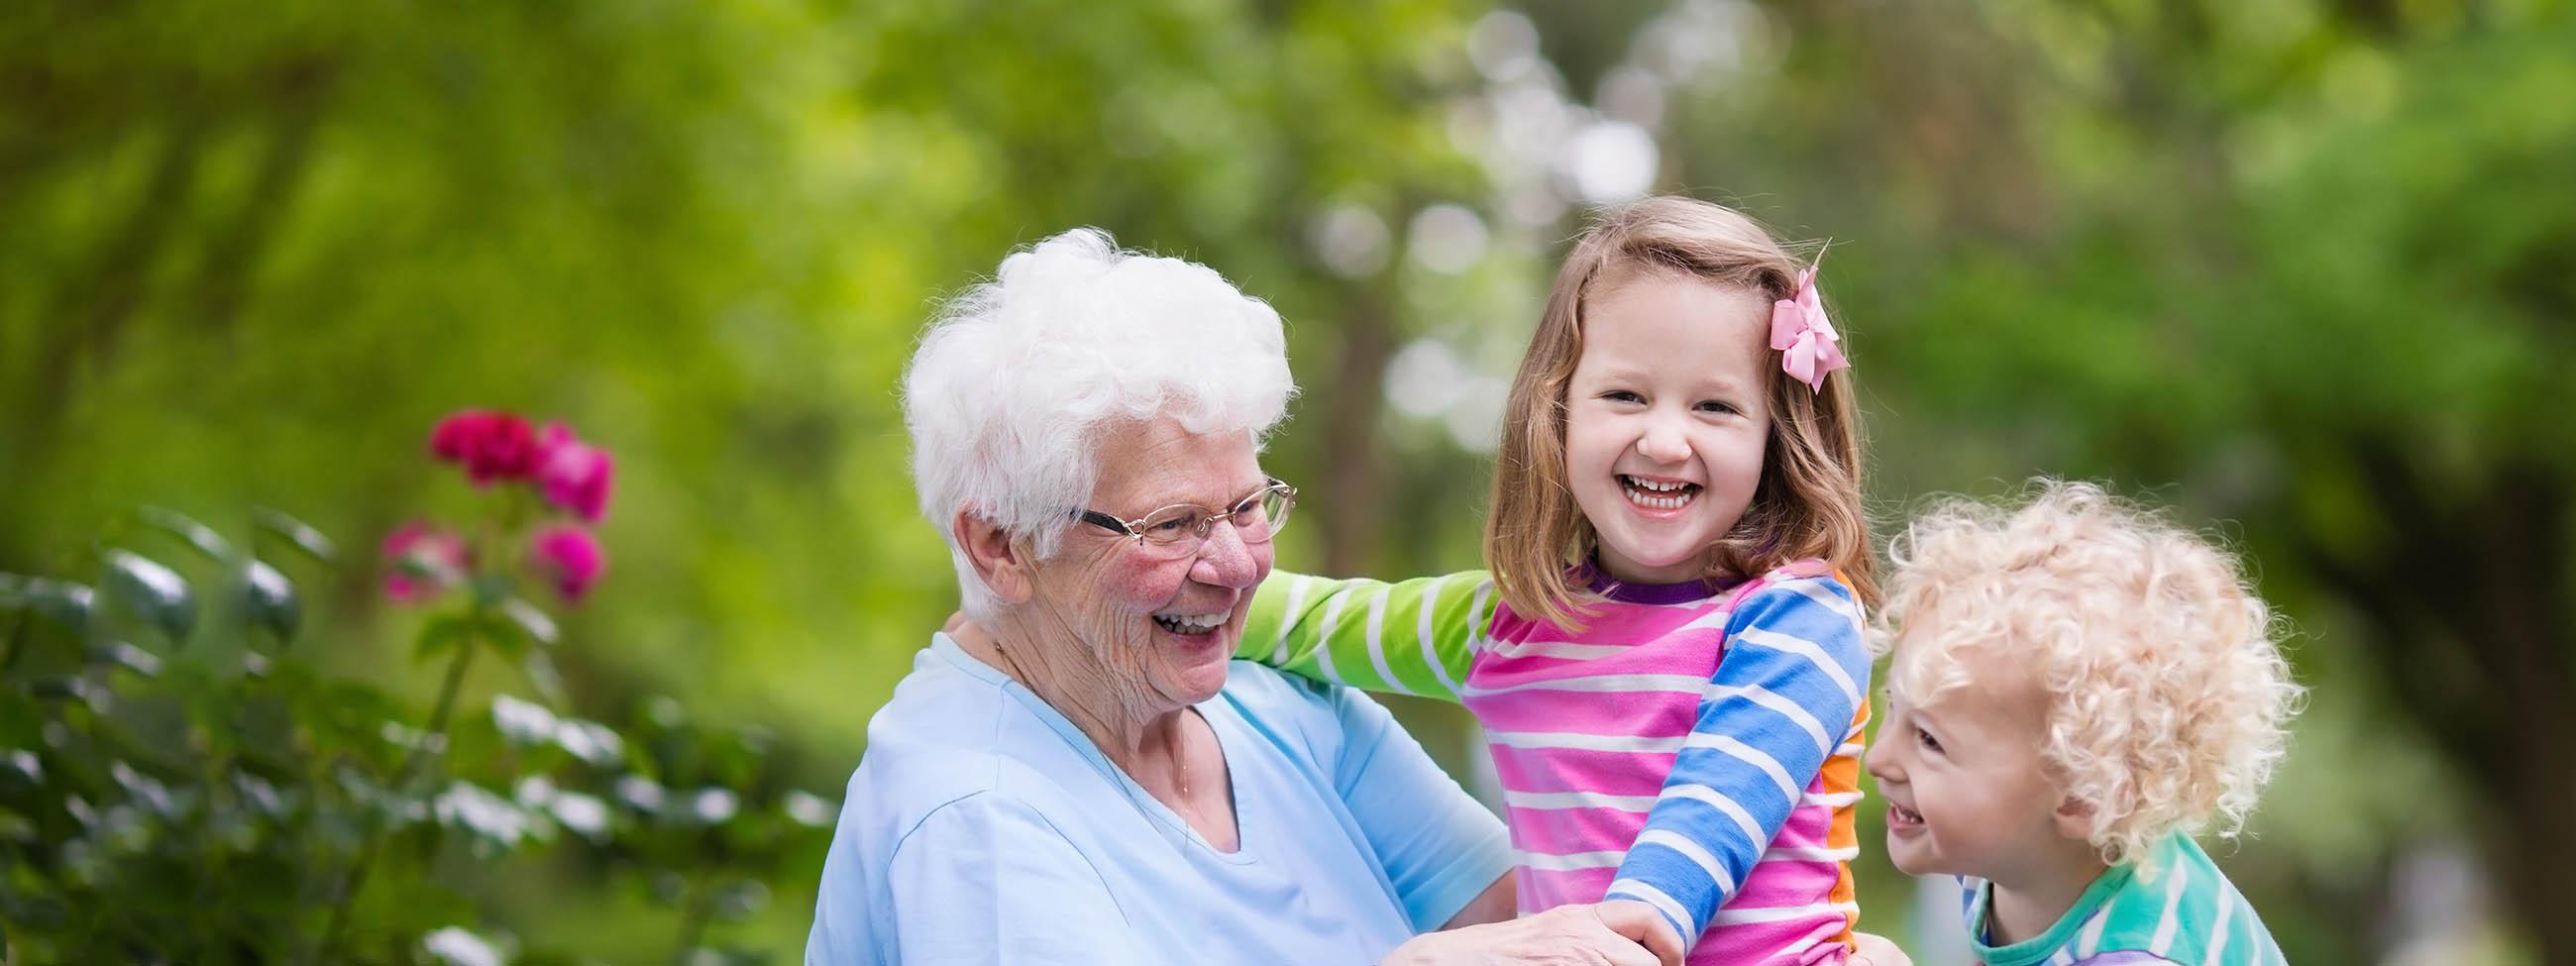 Ältere Dame mit Kindern